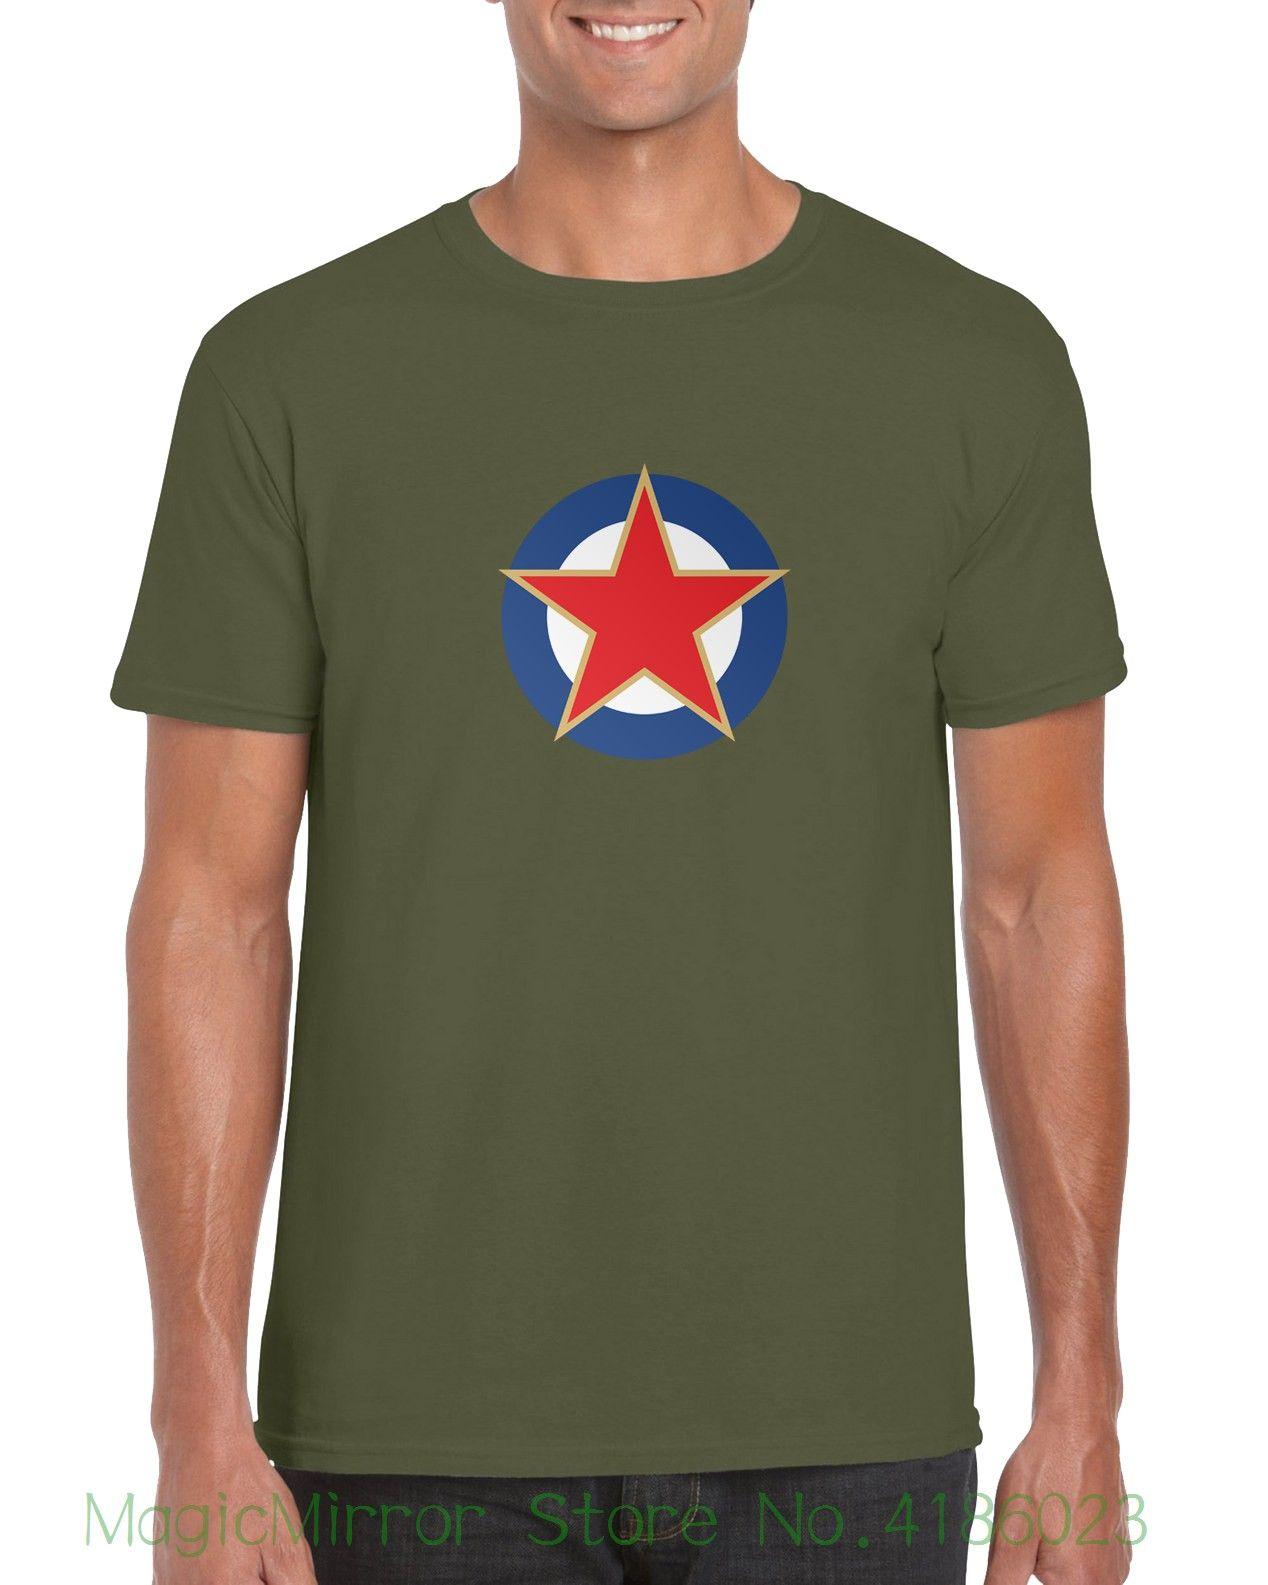 Acheter Yougoslavie Roundel Red Star Bleu Or Blanc Drapeau Rétro T Shirt T  Shirt Homme Casual Tees De  12.14 Du Magicmirrorstore   DHgate.Com 57b3f5ea4df